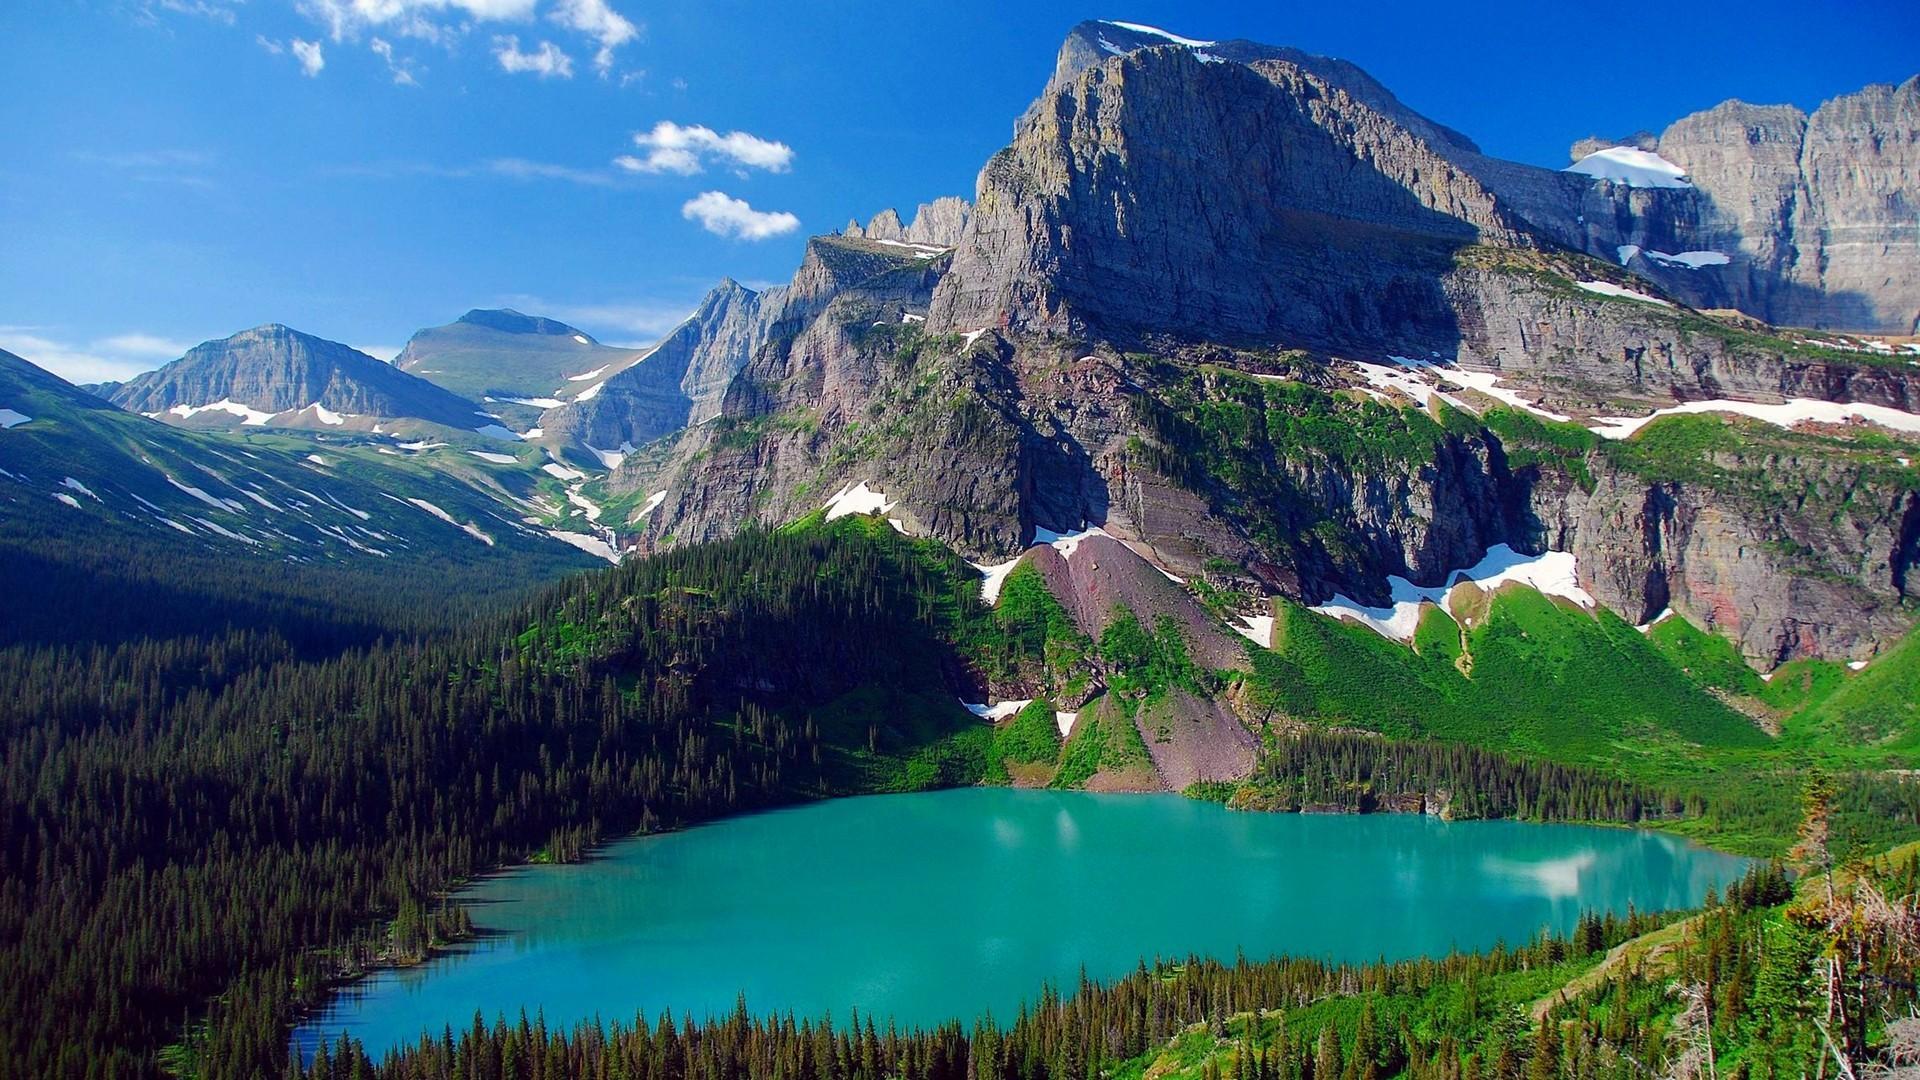 45 Glacier National Park Wallpaper Images On Wallpapersafari